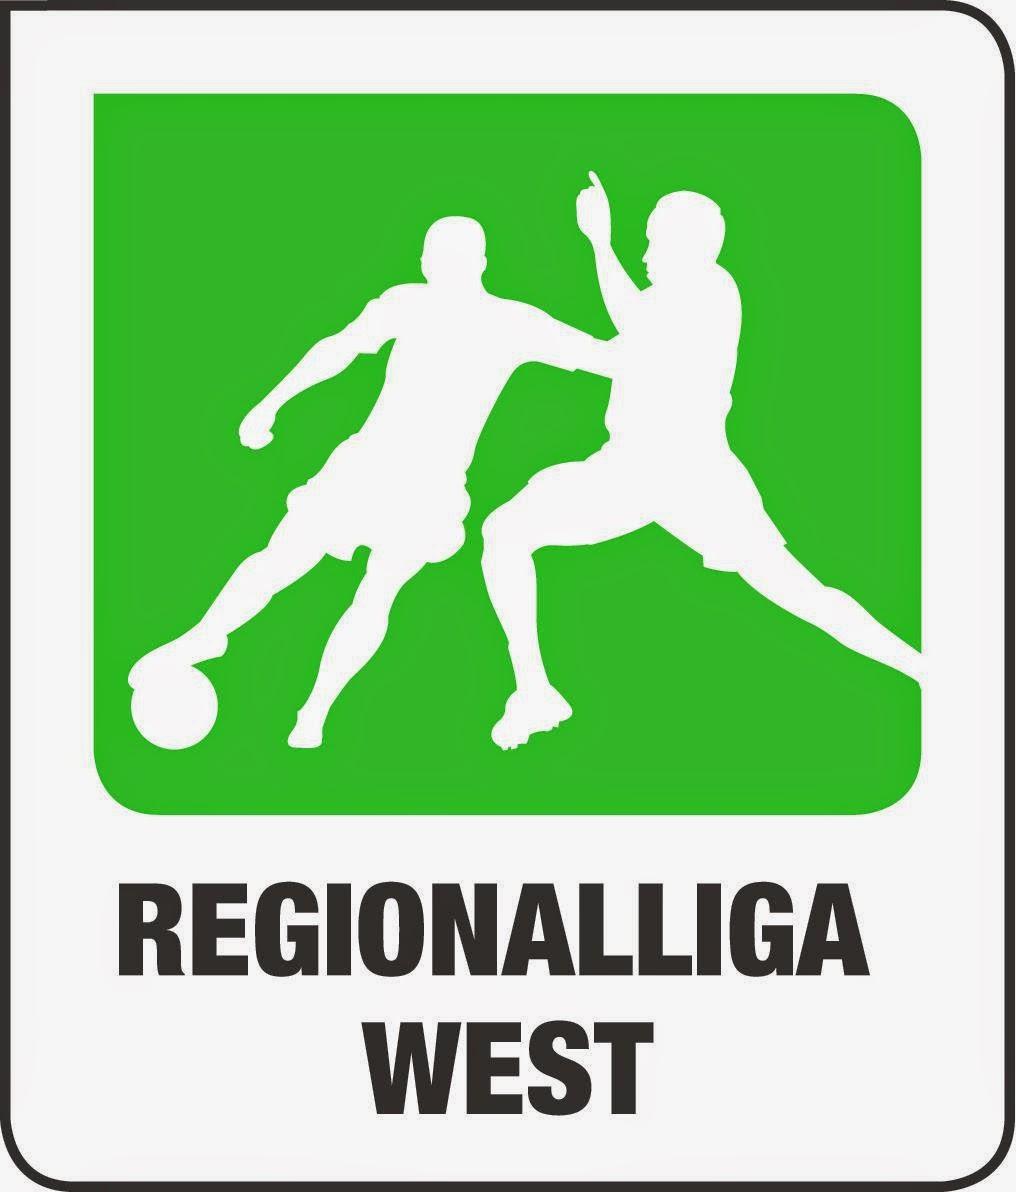 regionalligawest